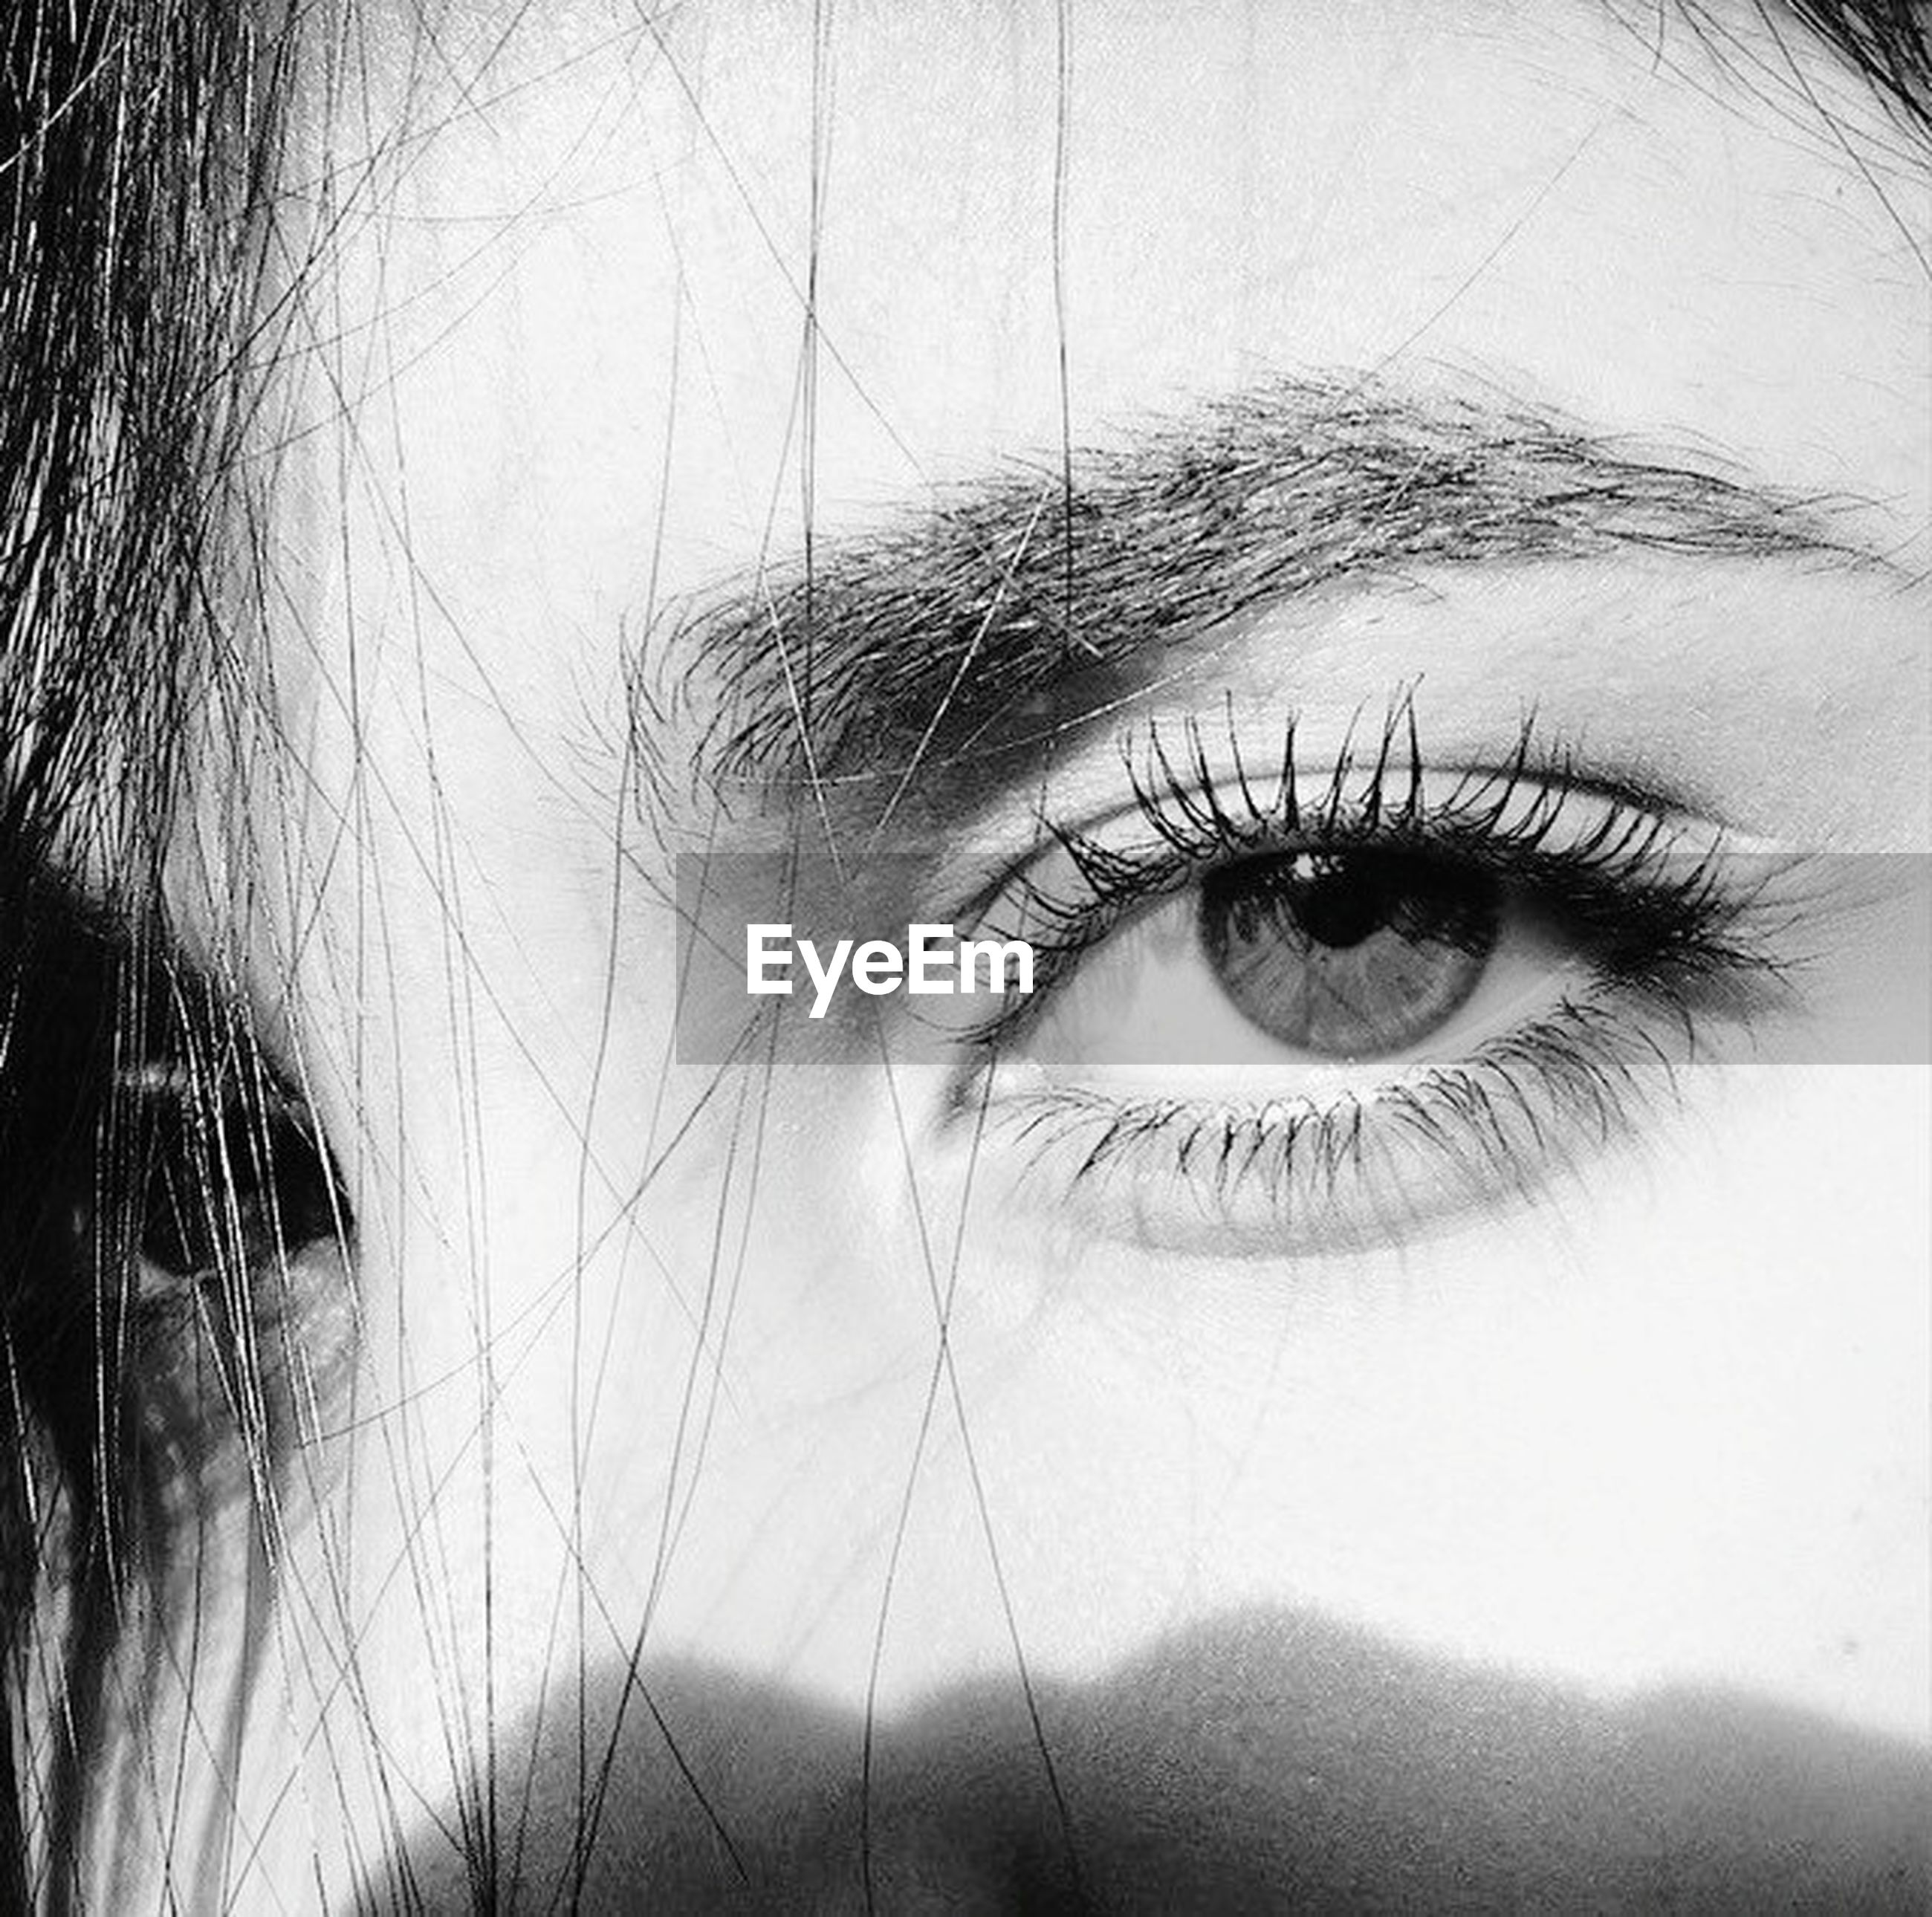 human eye, looking at camera, close-up, portrait, headshot, human face, eyelash, lifestyles, young adult, person, eyesight, indoors, young women, sensory perception, human skin, front view, eyebrow